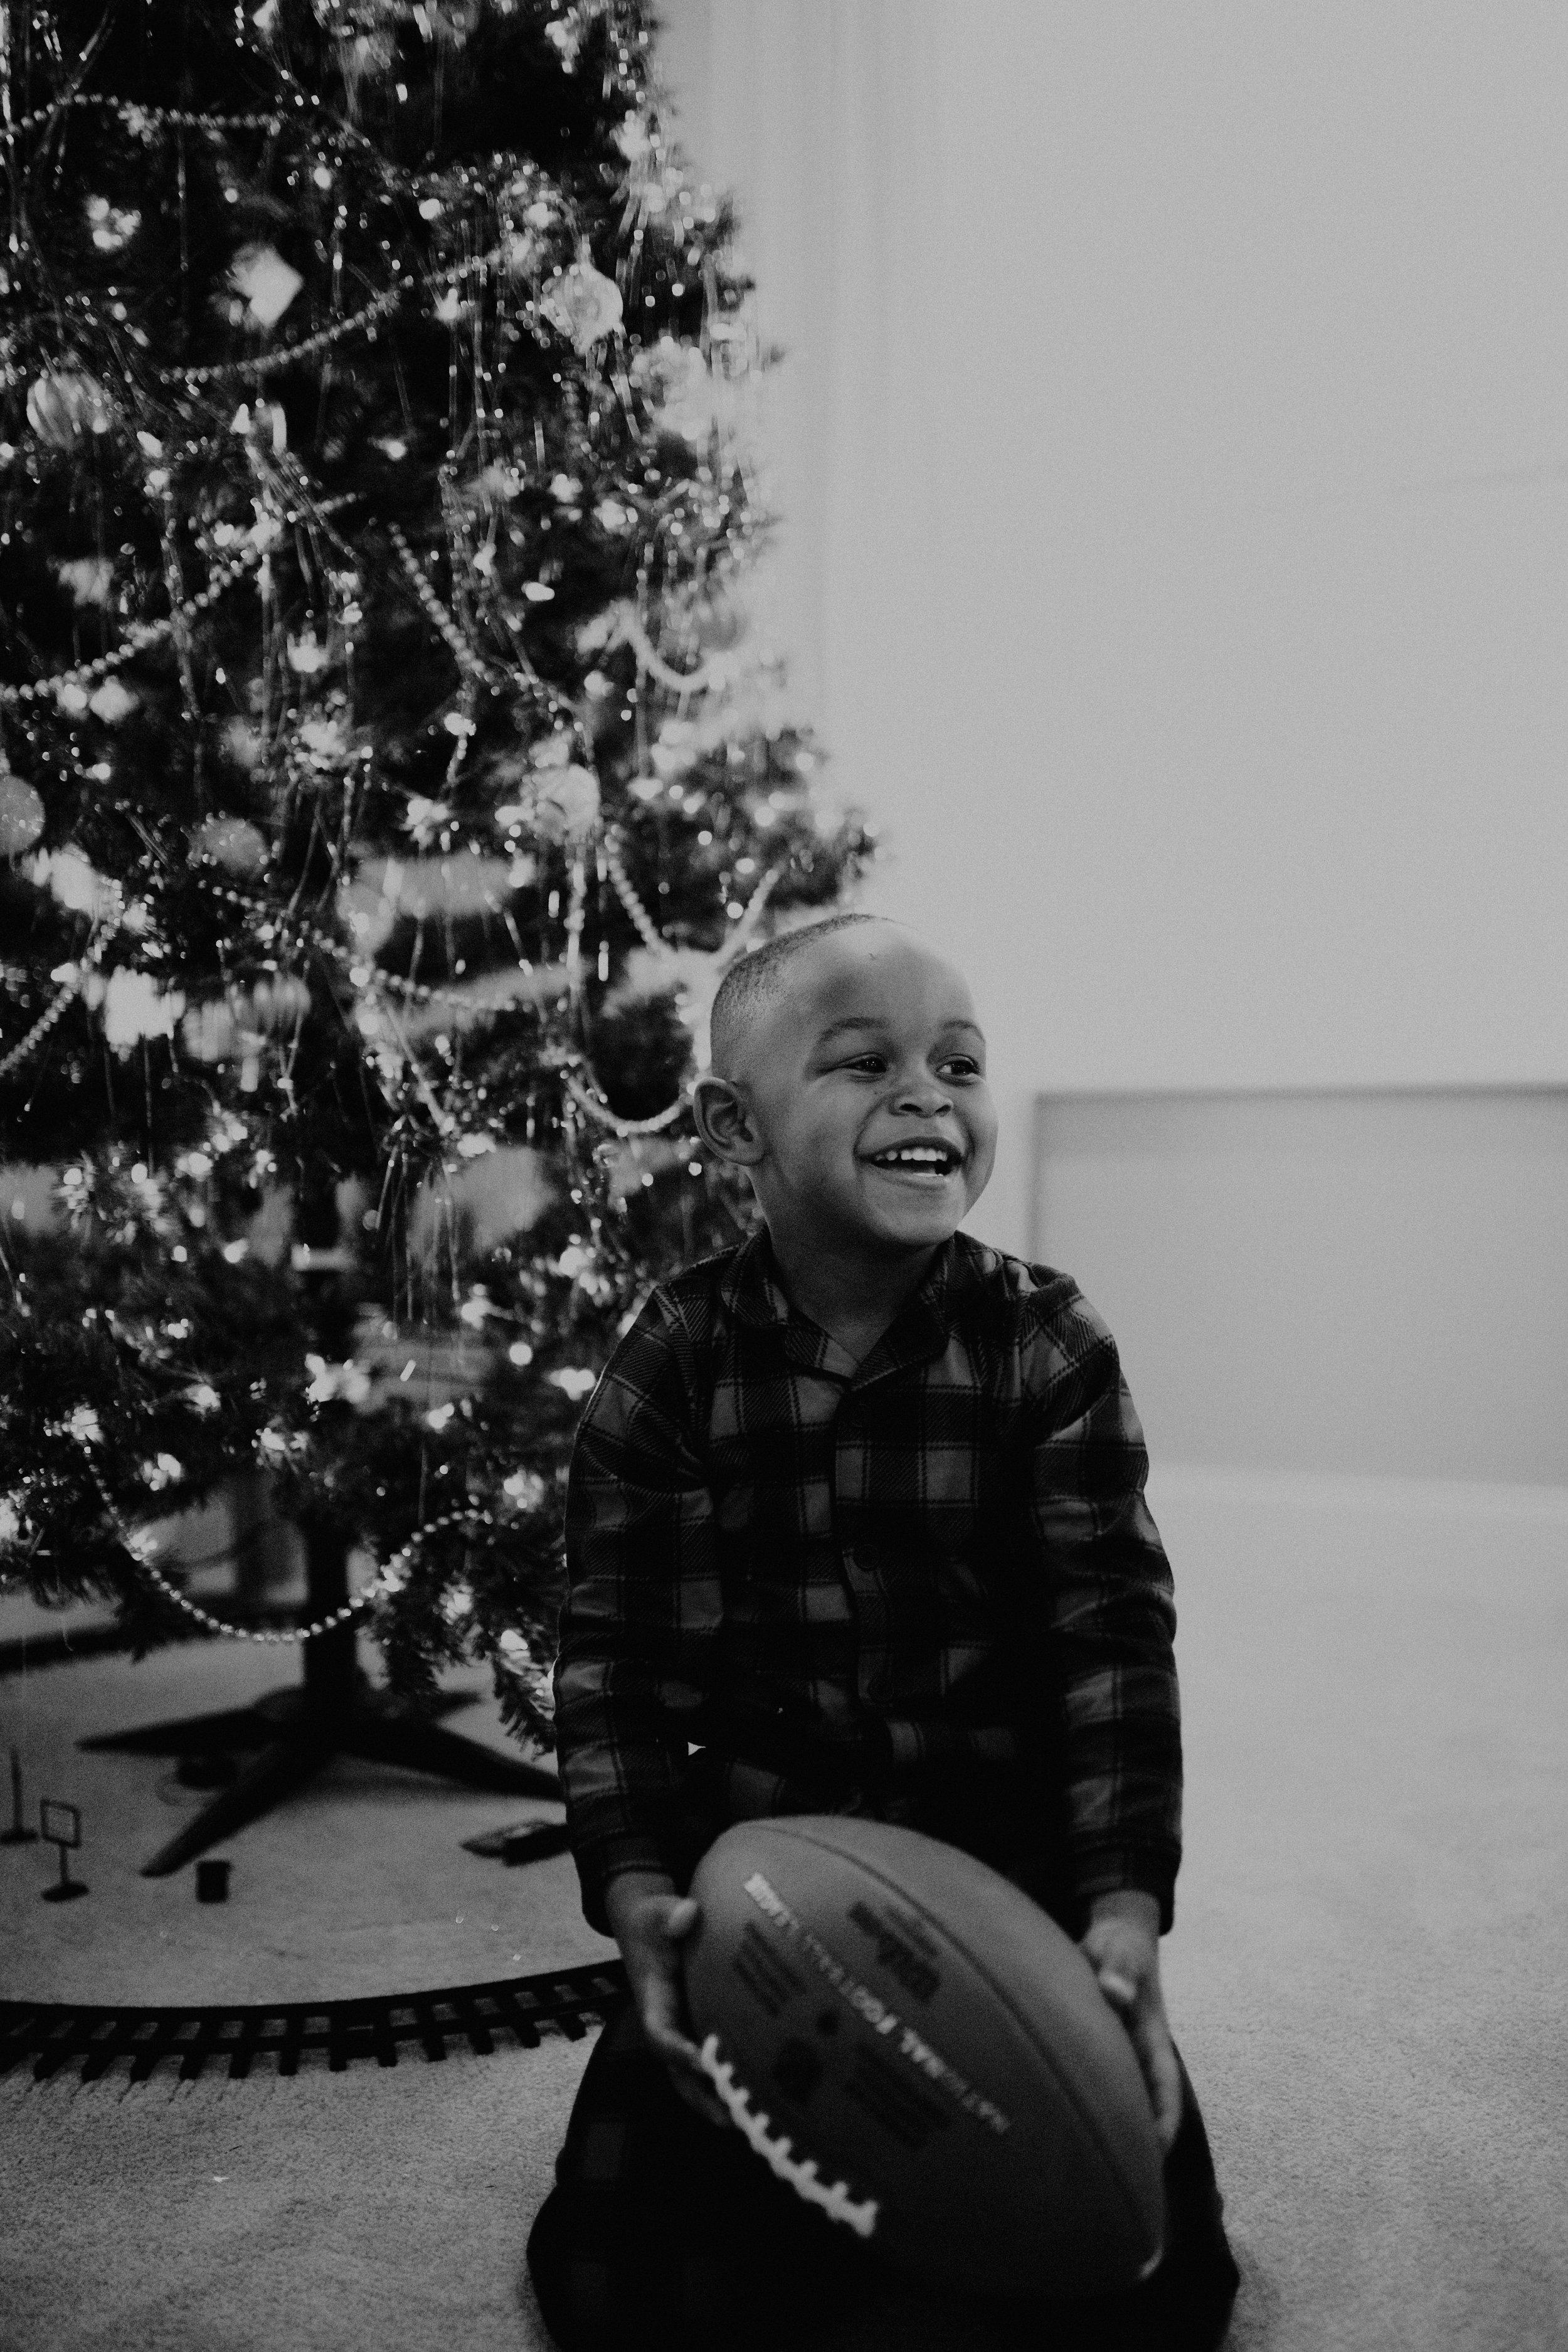 Boys Christmas 77 (1 of 1).jpg